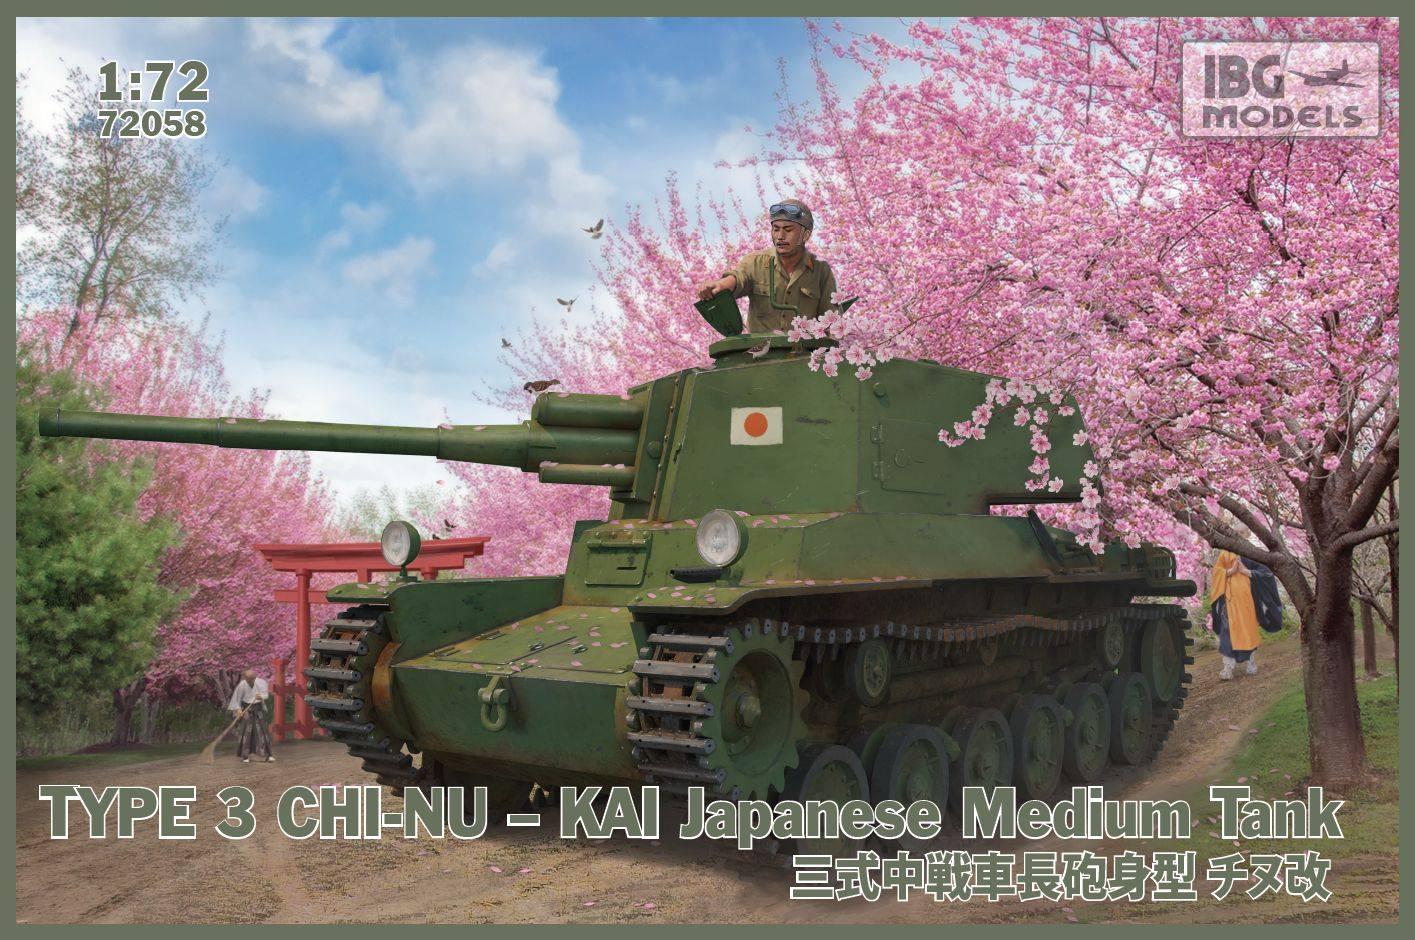 1/72 Type 3 Chi-Nu – Kai Japanese Medium Tank 72058